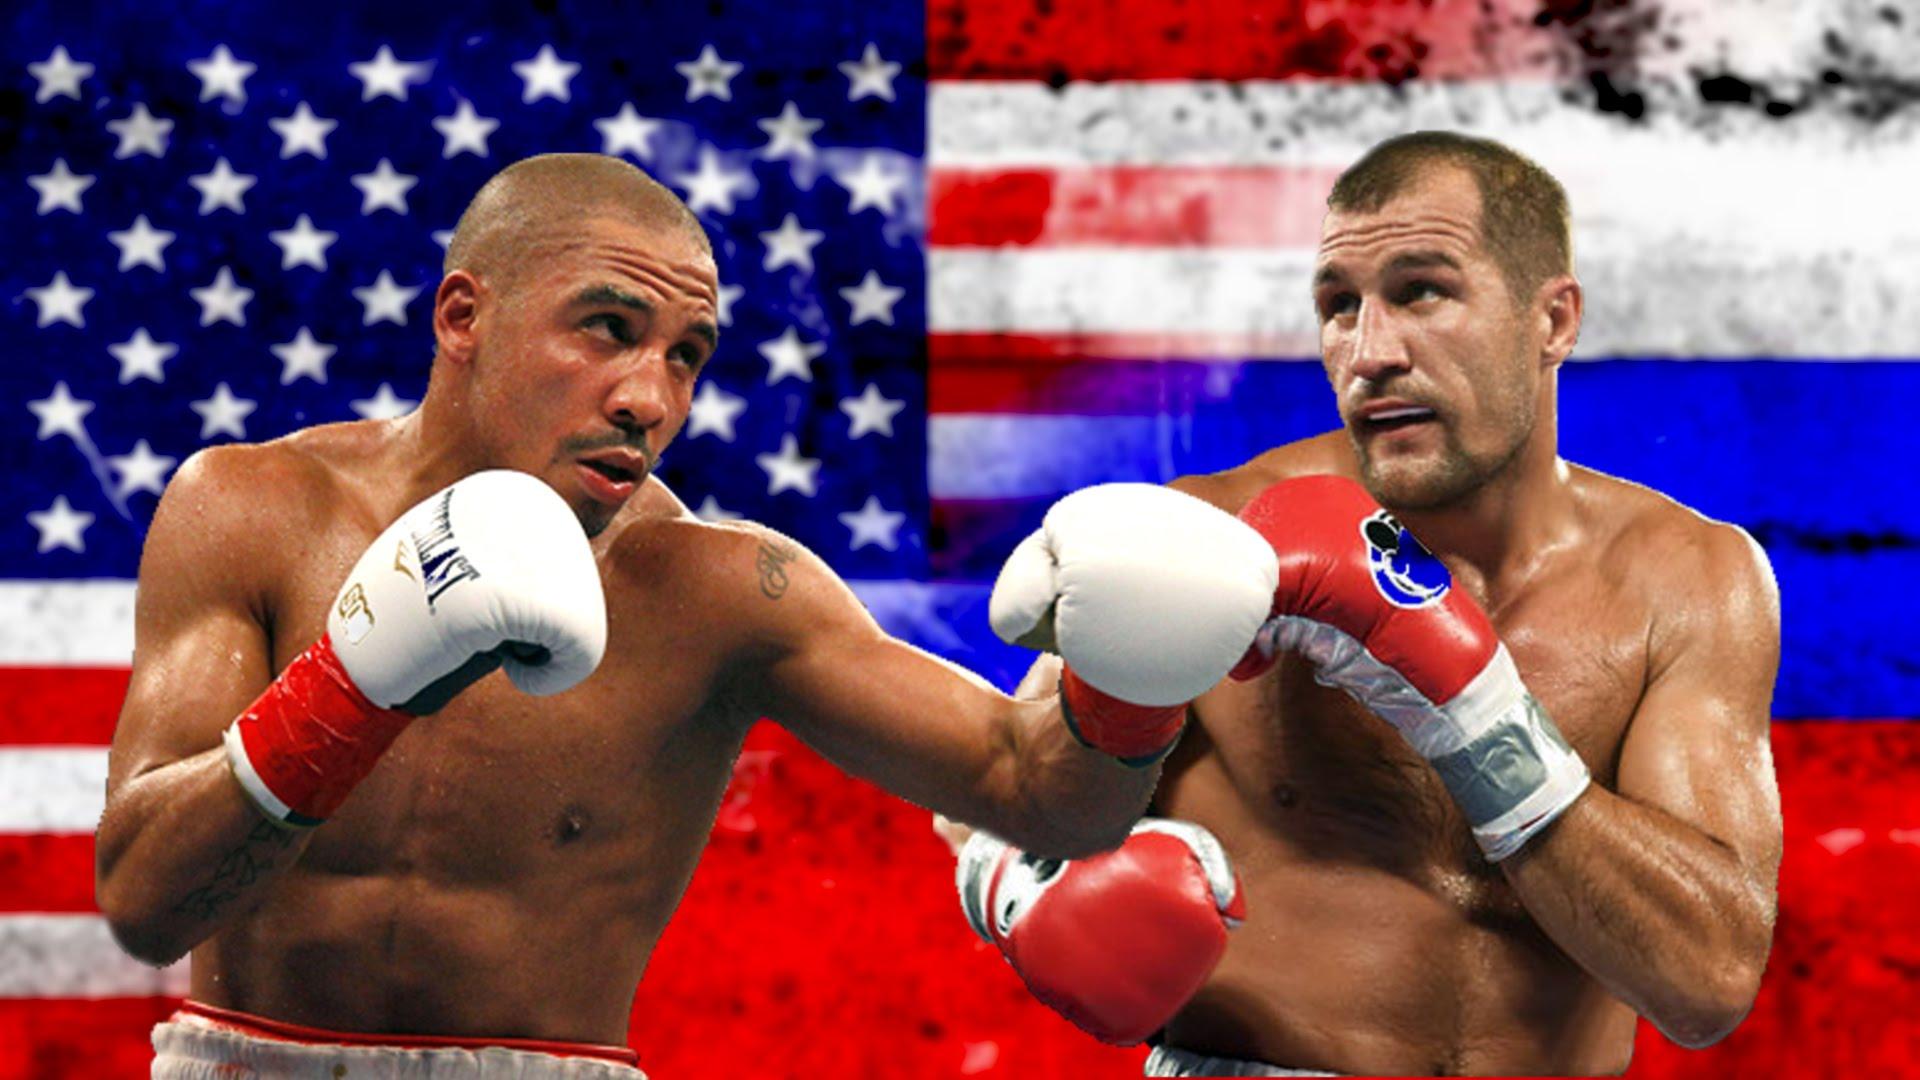 Ковалев - Уорд: бой за титул чемпиона мира по версии WBA, IBF, WBO